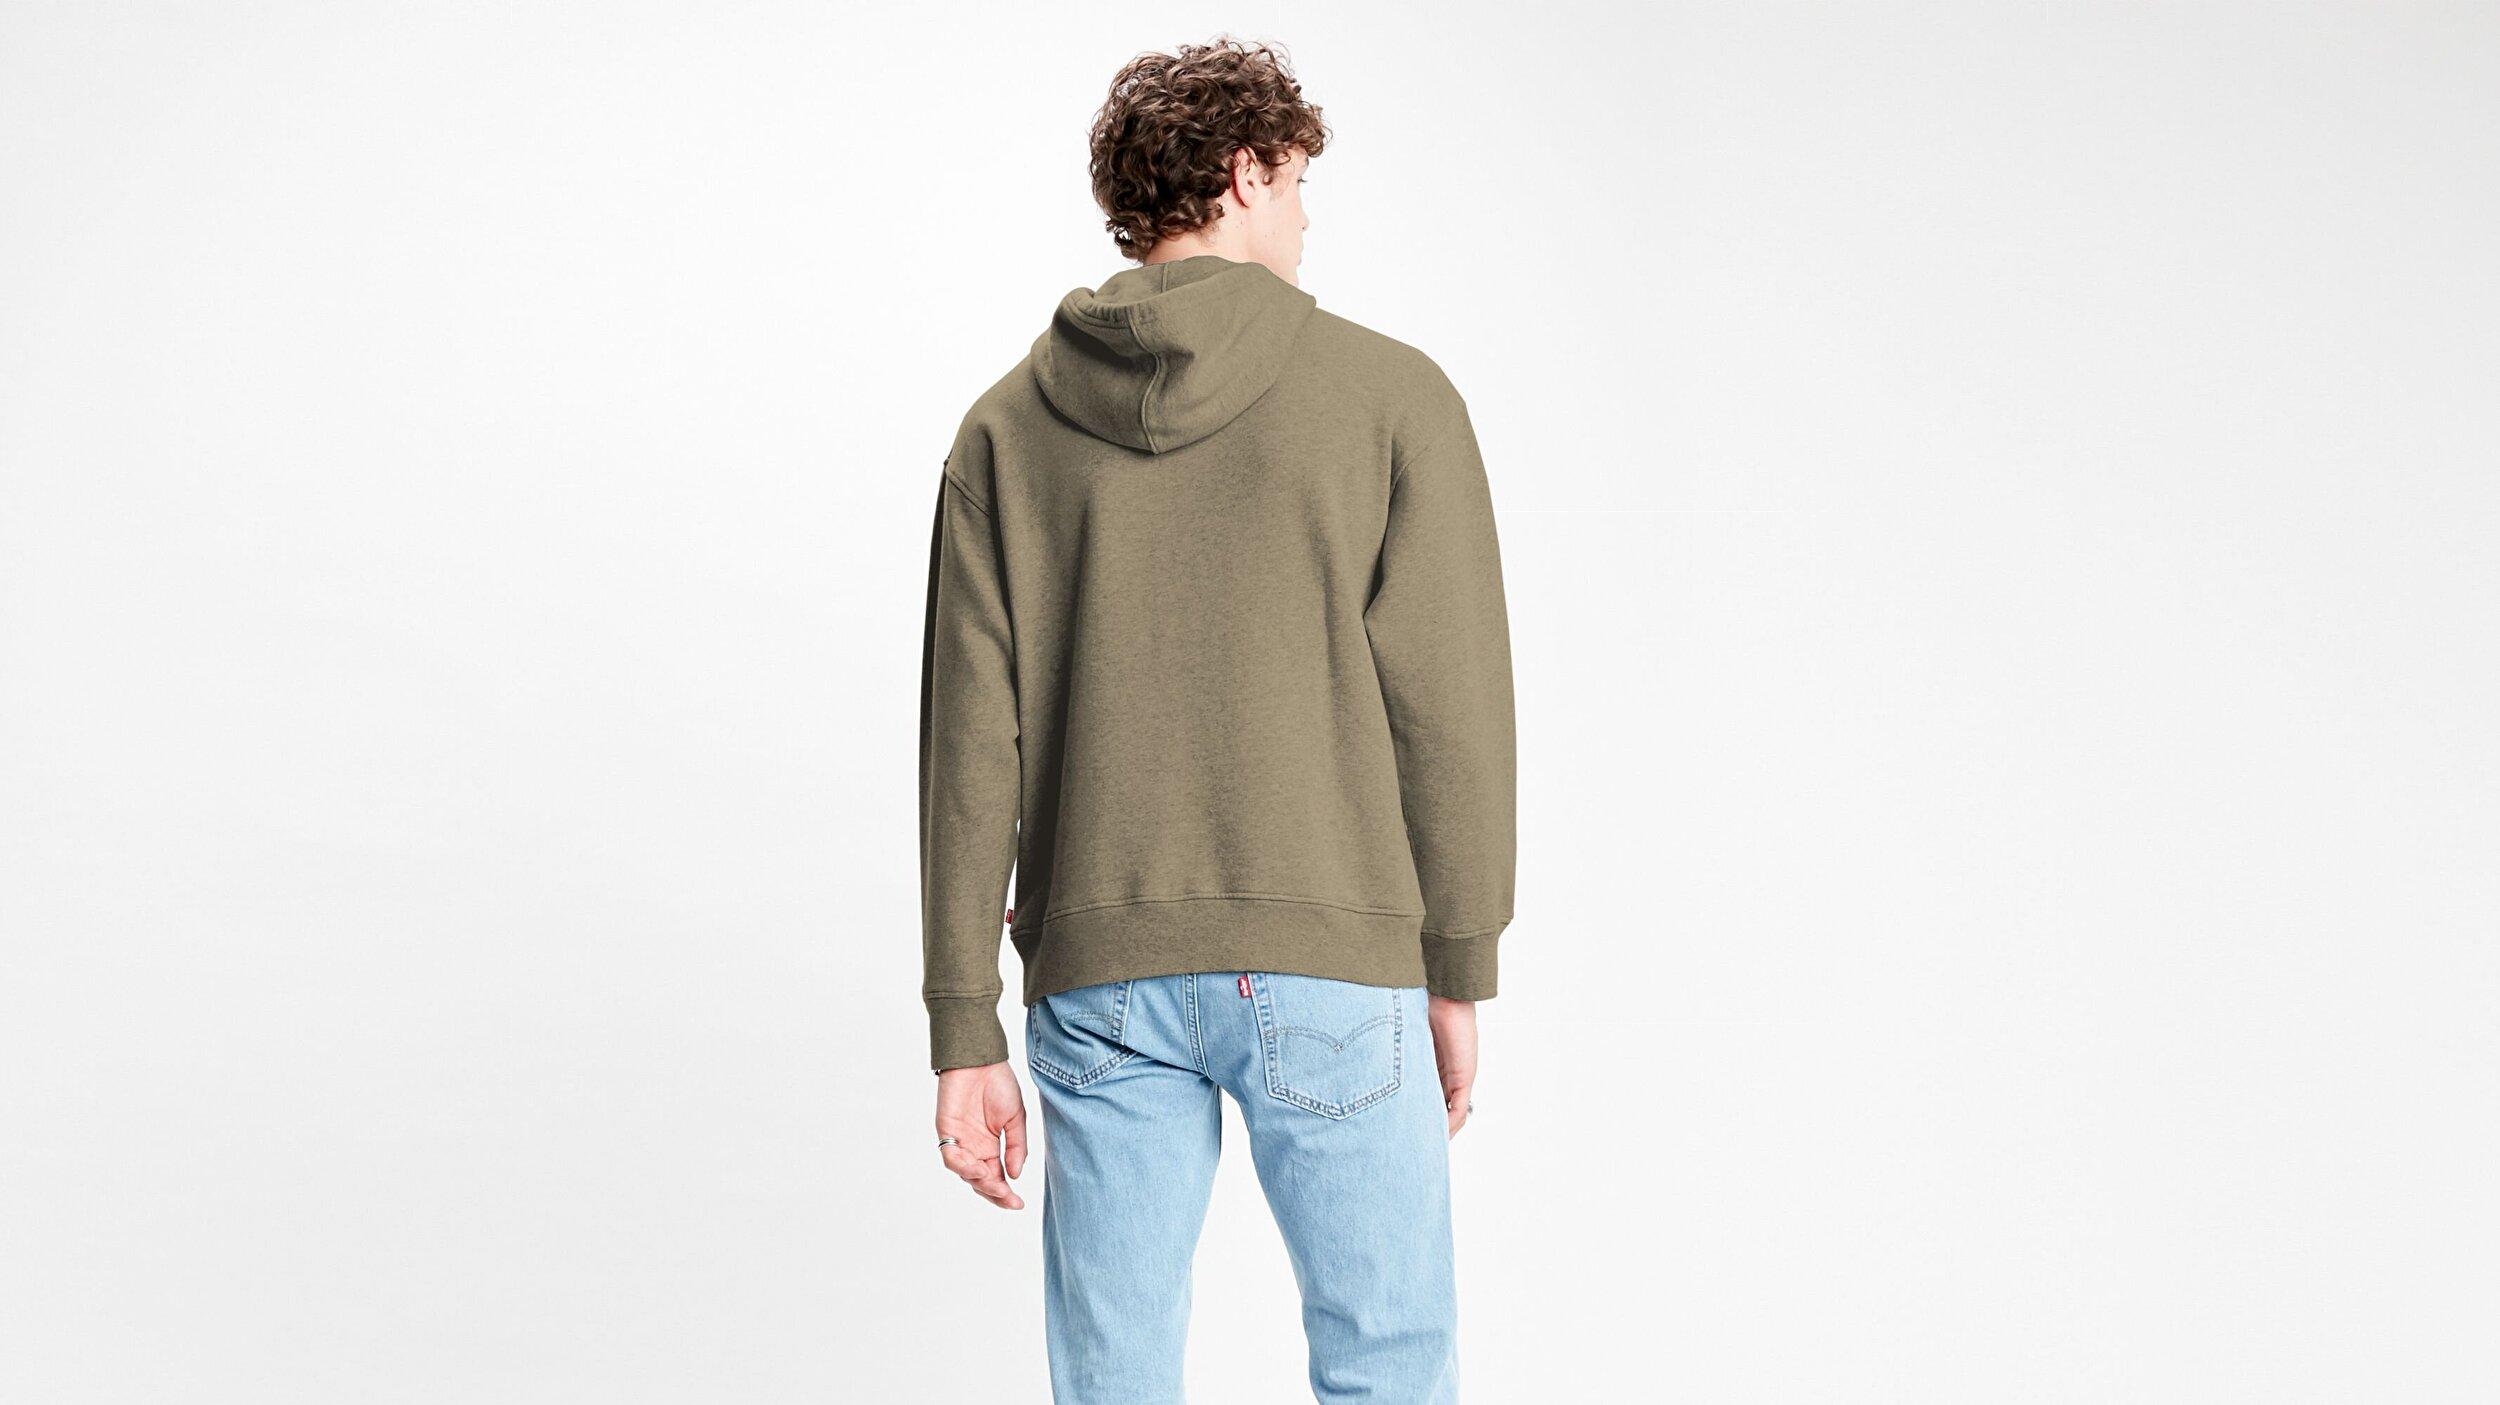 Relaxed Graphic Hoodie Ssnl Serif Beyaz Erkek Kapüşonlu Sweatshirt